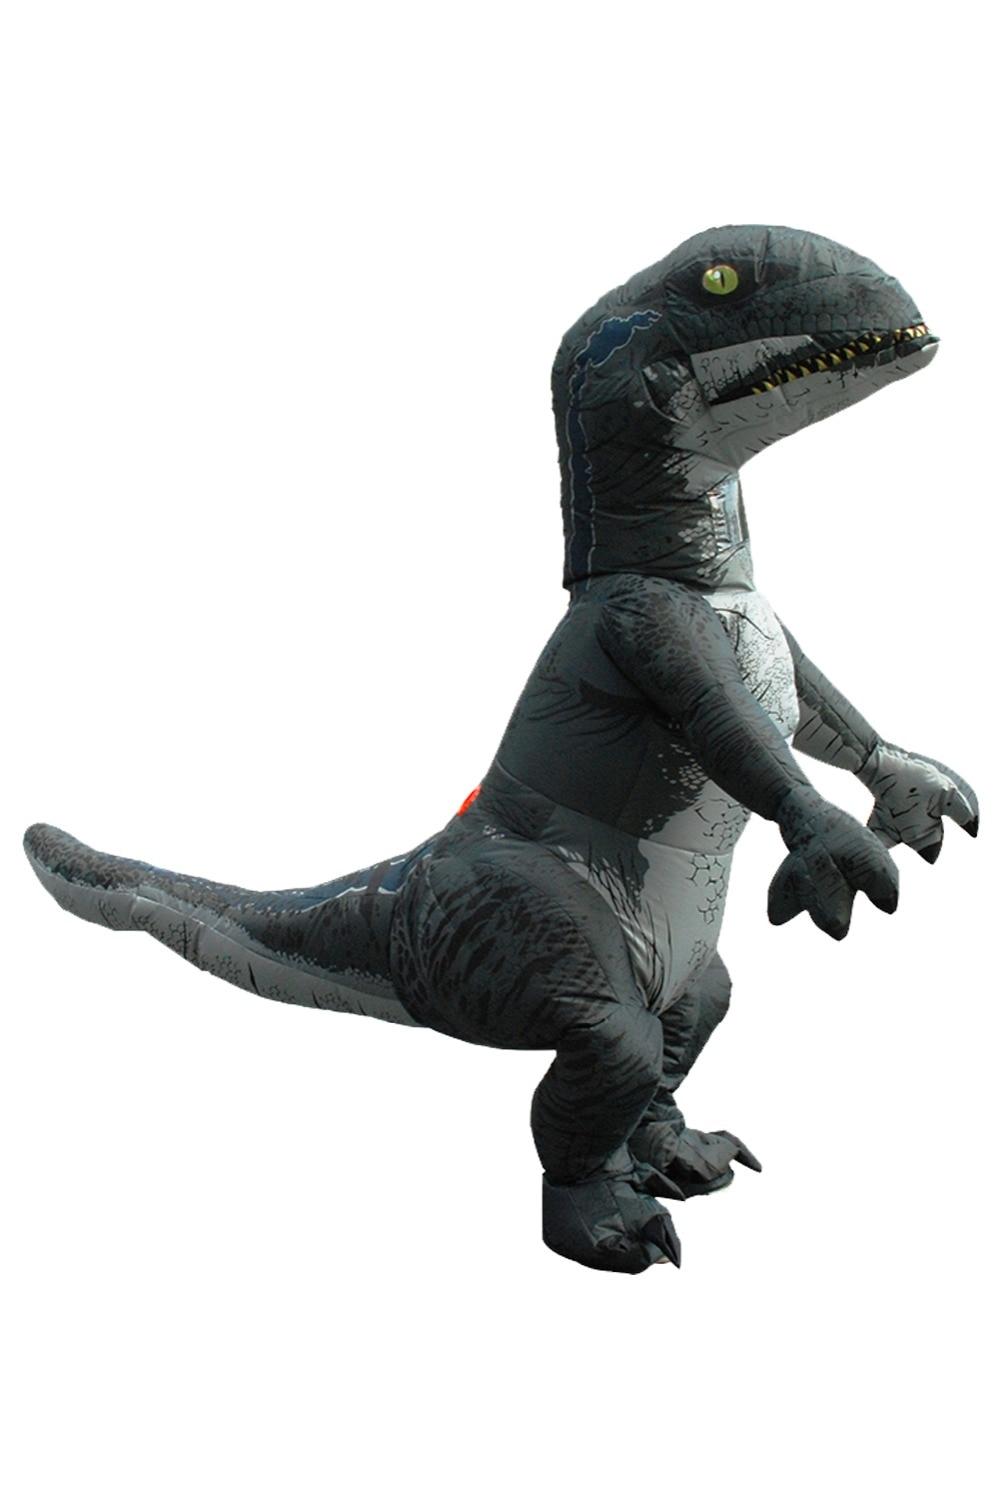 Jurrasic World Inflatable Costume Halloween Cosplay Inflatable Raptor Dinosaur Costume Funny Dress Suit